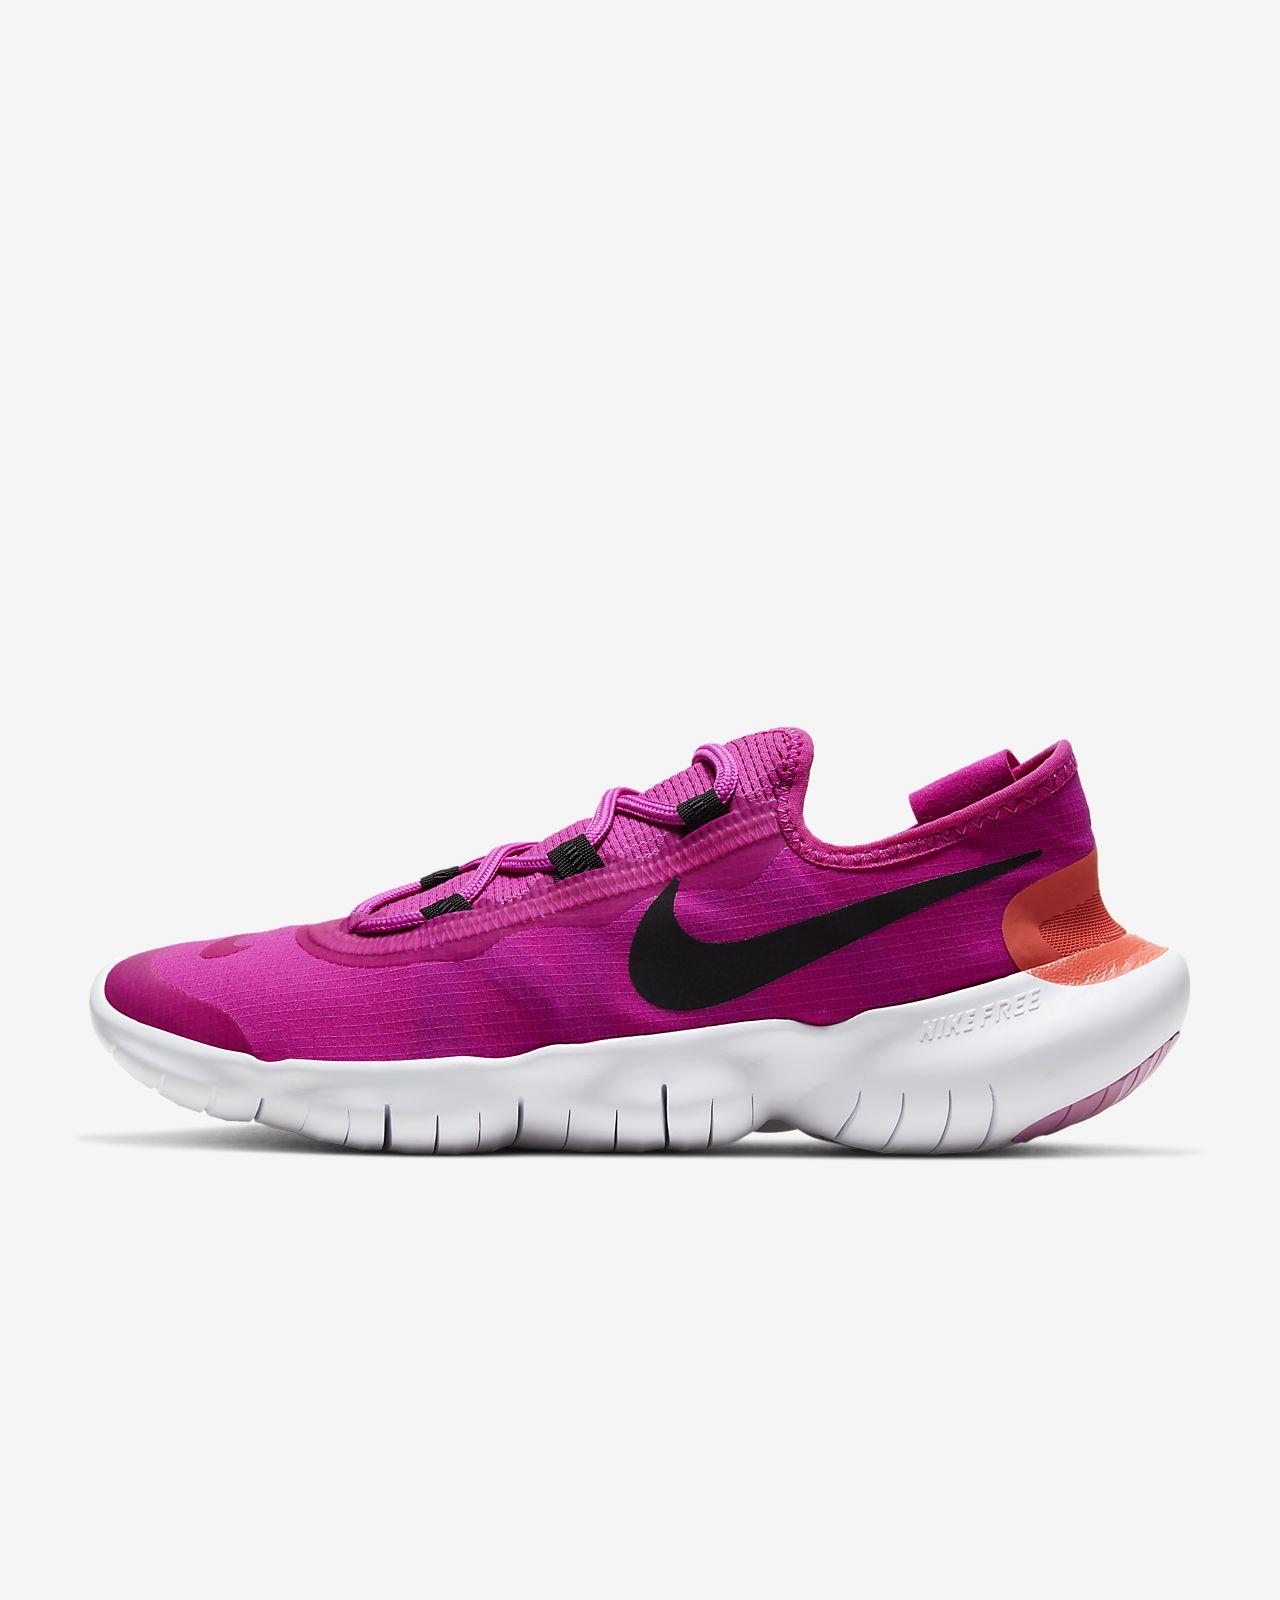 Nike Free RN 5.0 2020 Women's Running Shoe